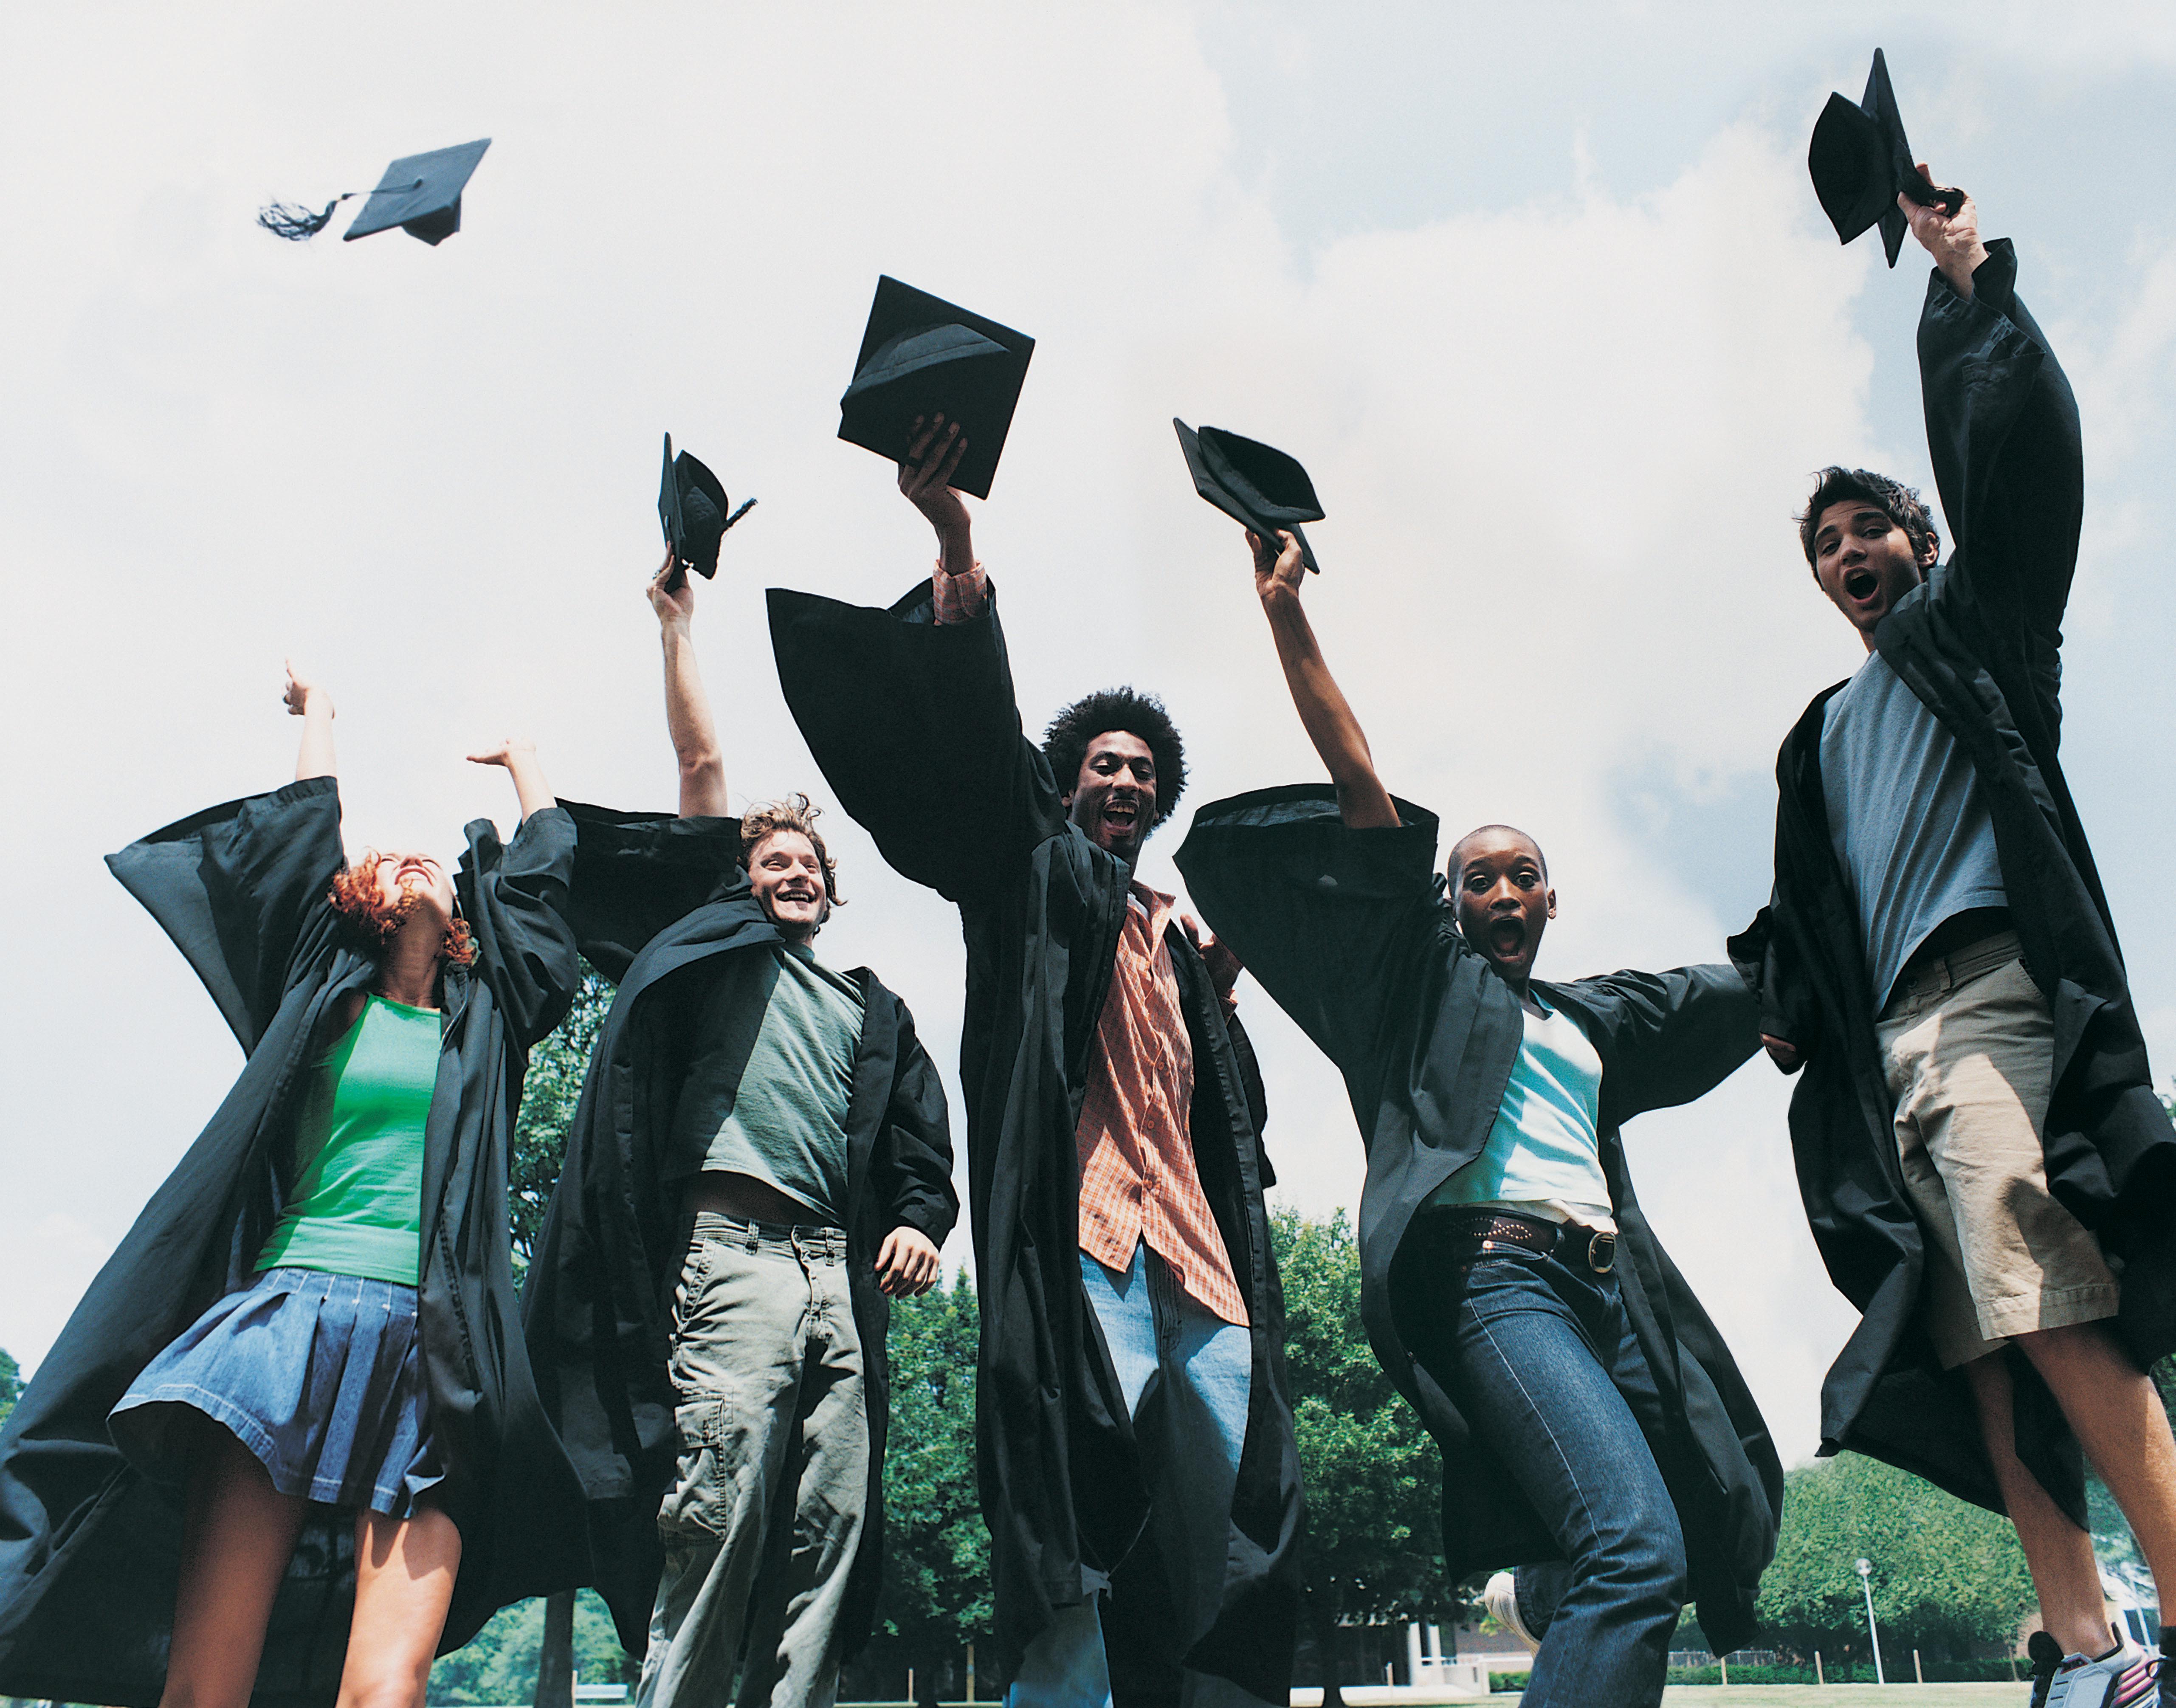 Five Students Jumping for Joy at Graduation